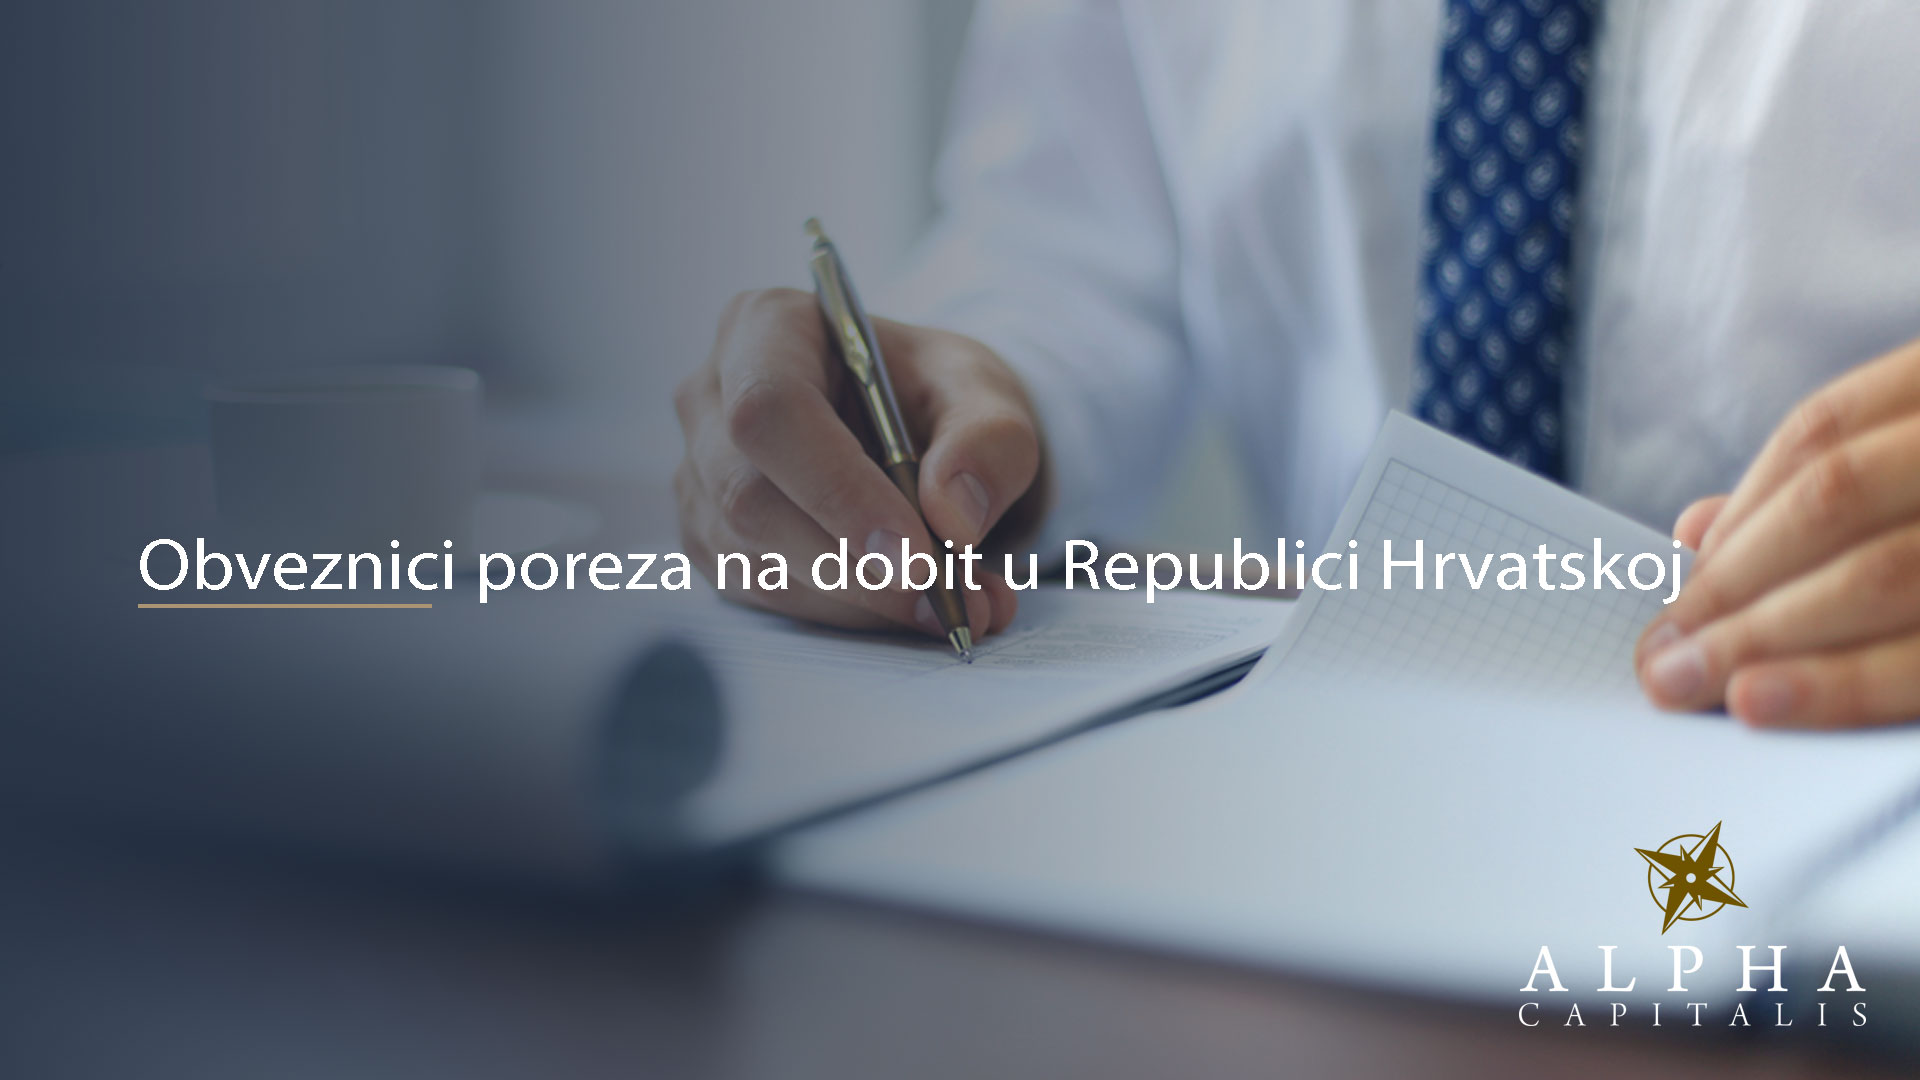 alpha-capitalis-blog-obveznici-pdv